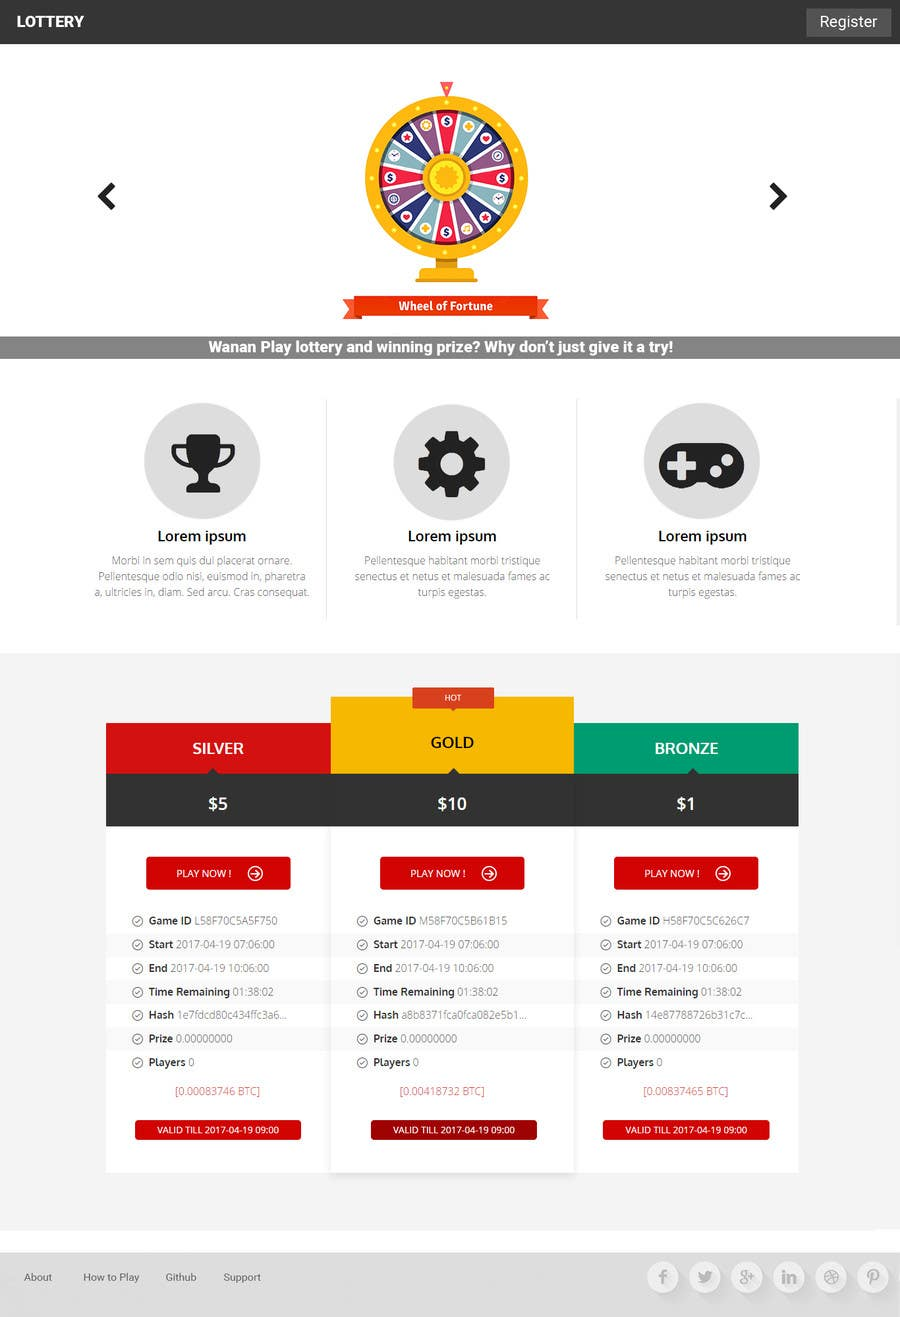 Proposition n°5 du concours logo + website design for lottery an easy task for a designer